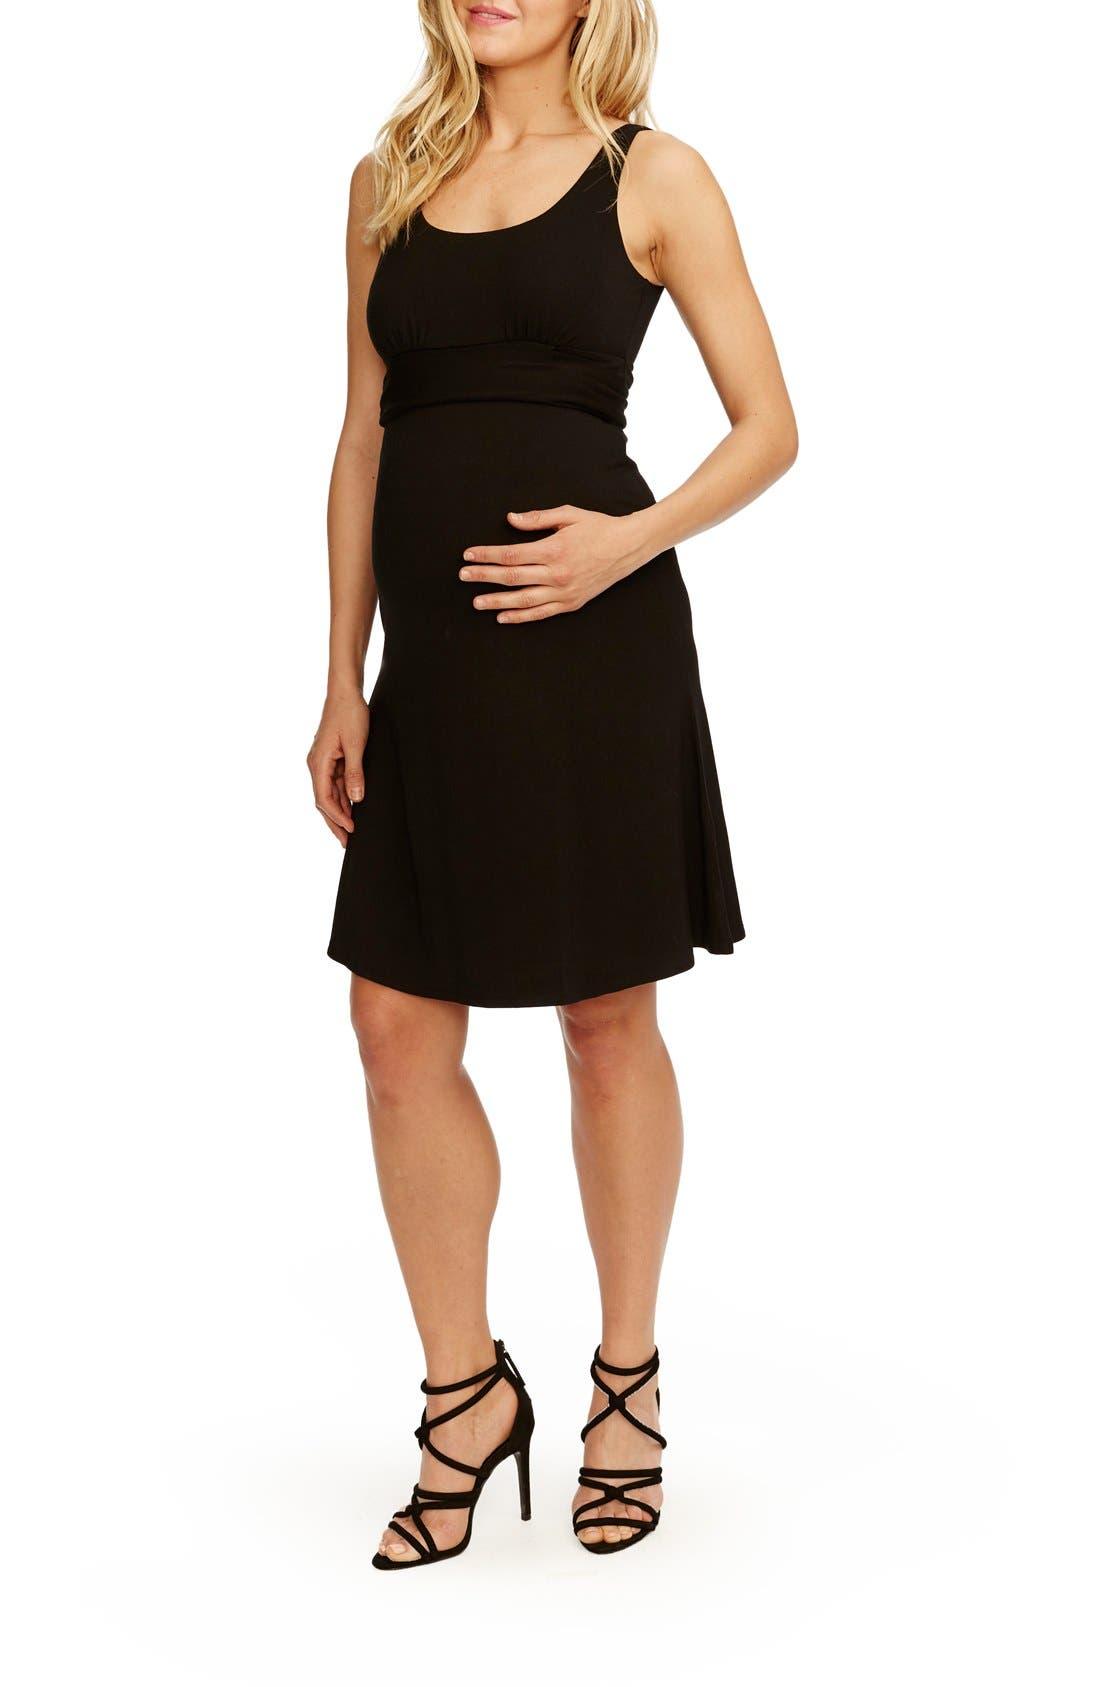 Alternate Image 1 Selected - Rosie Pope 'Best' Maternity Dress